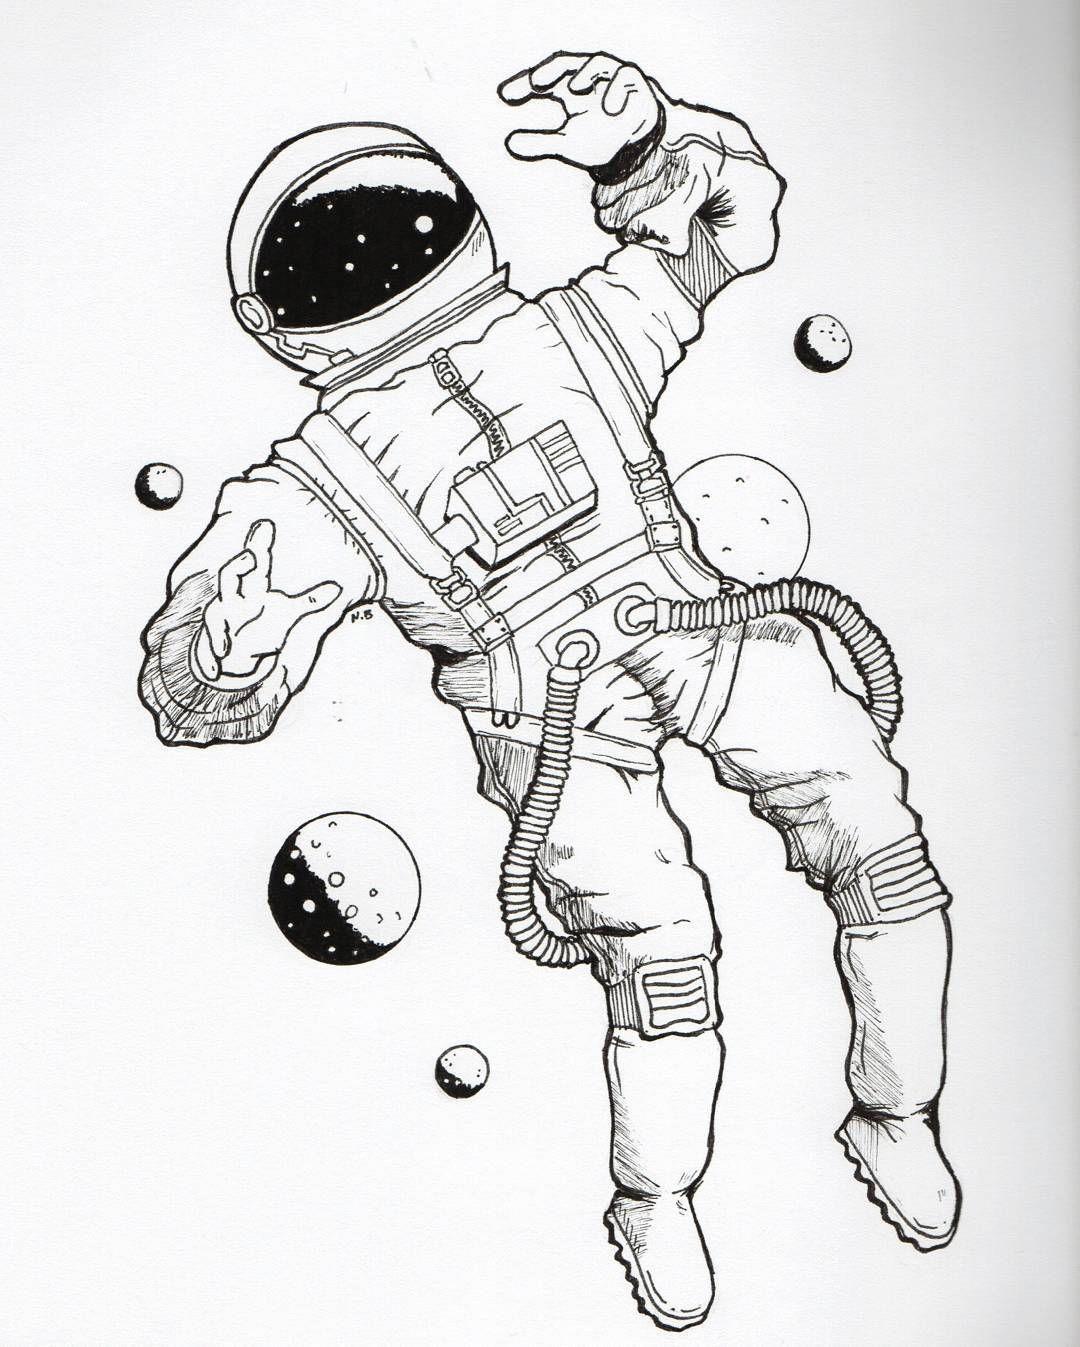 break dancing astronaut drawing - 735×917